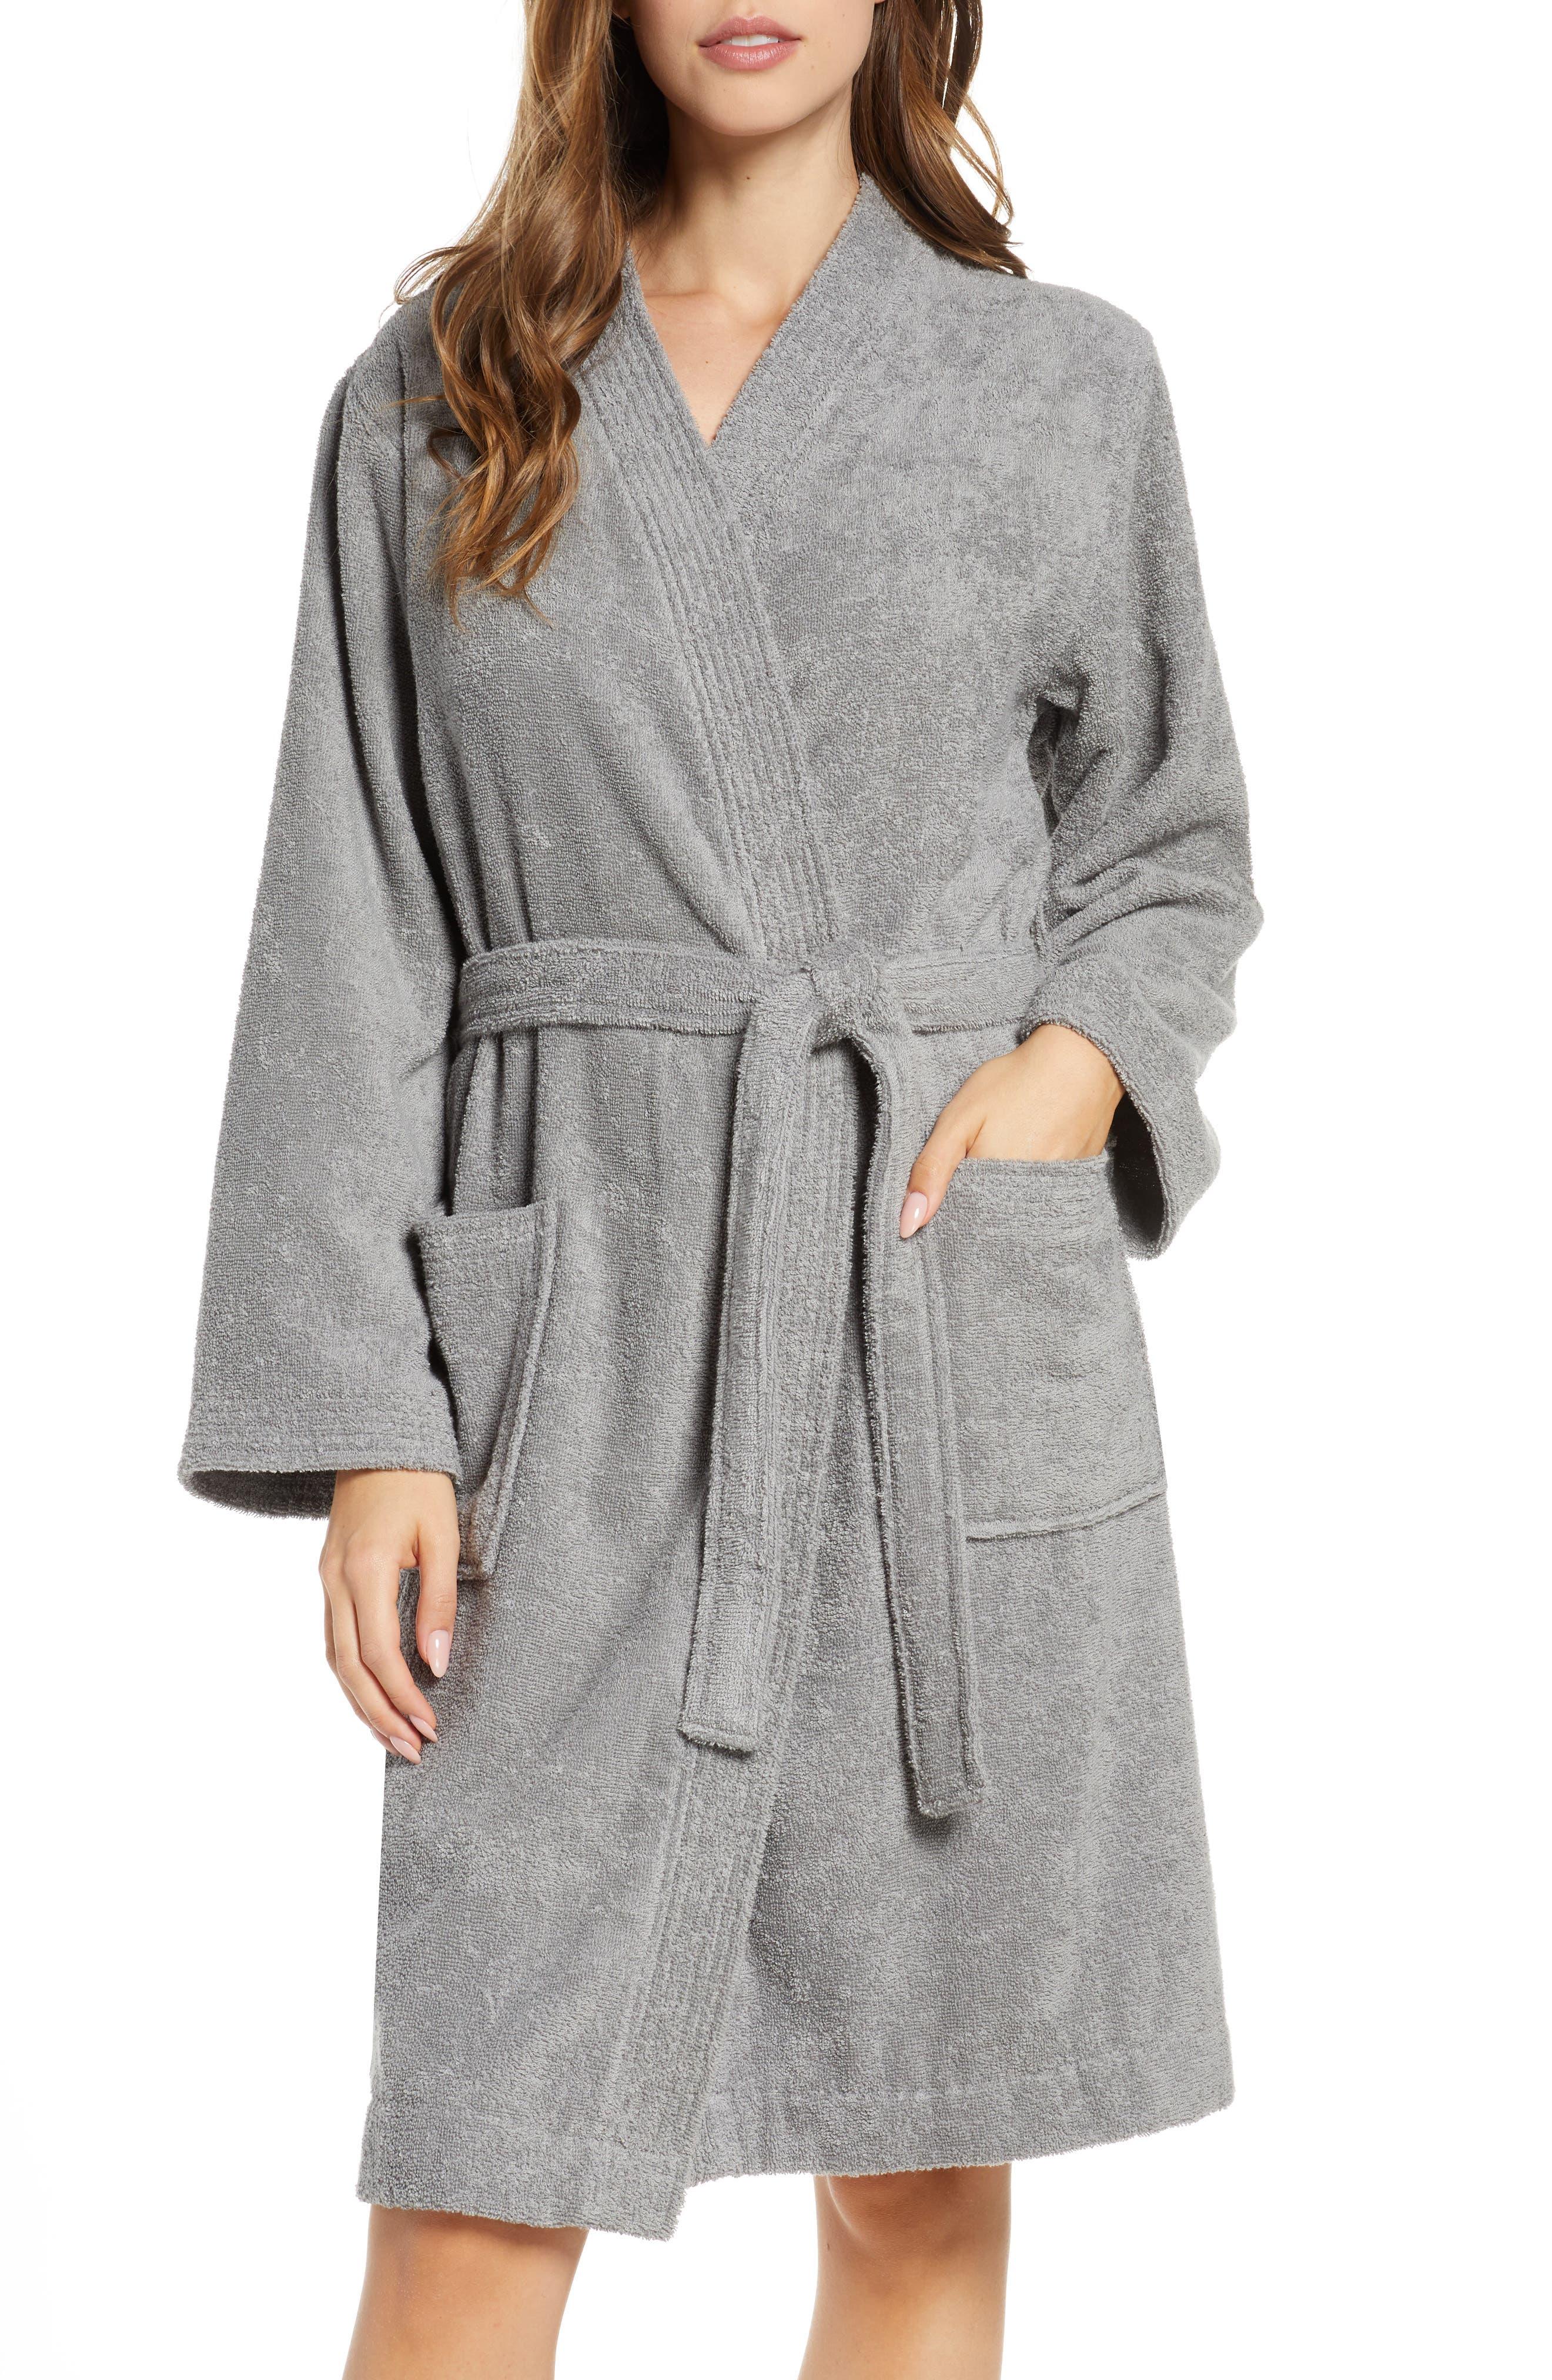 UGG® Lorie Terry Short Robe (Regular & Plus Size)